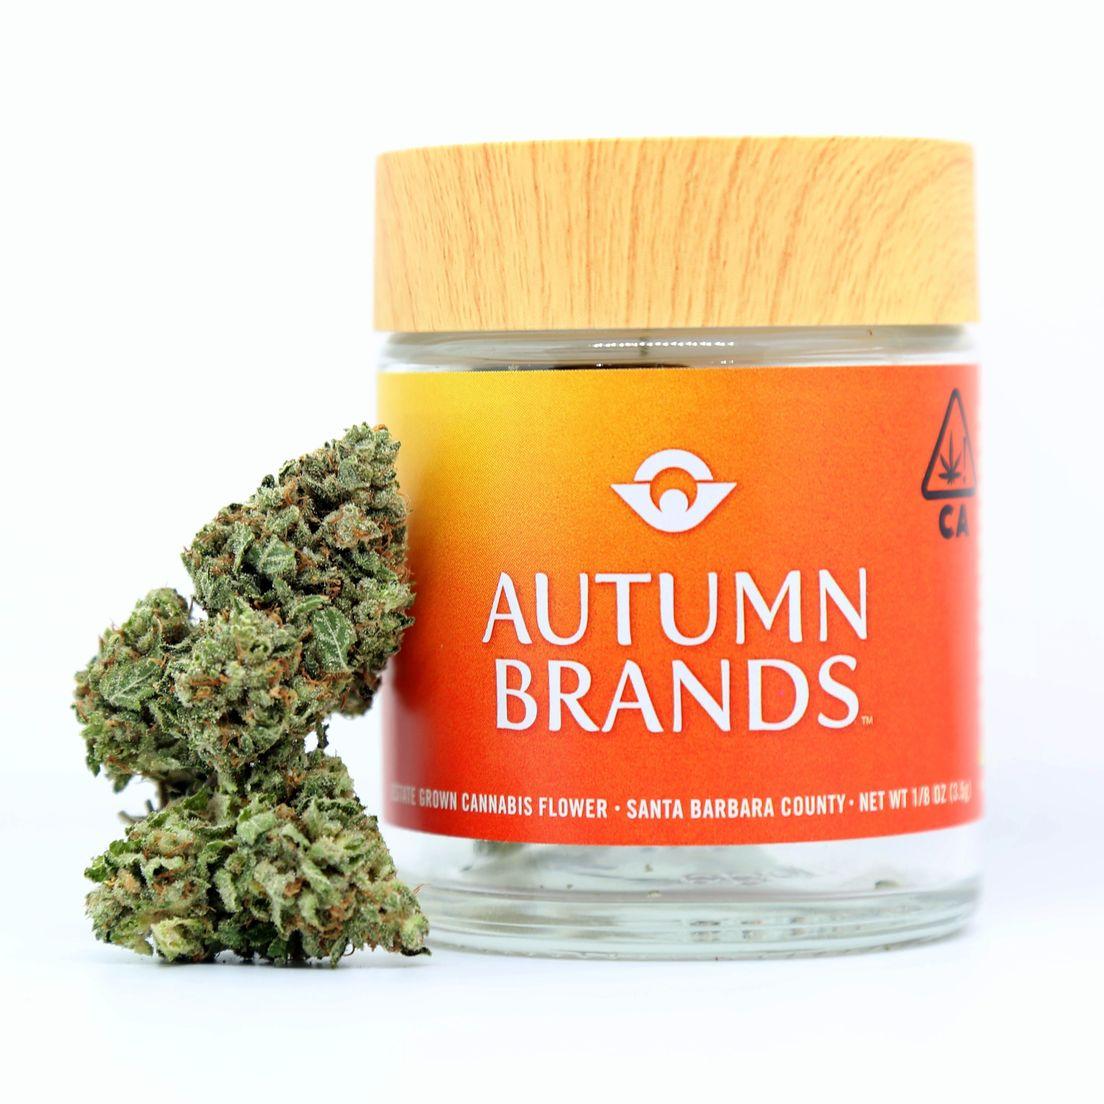 B. Autumn Brands 3.5g Flower - Quality 8/10 - Wedding Cake (~25%)